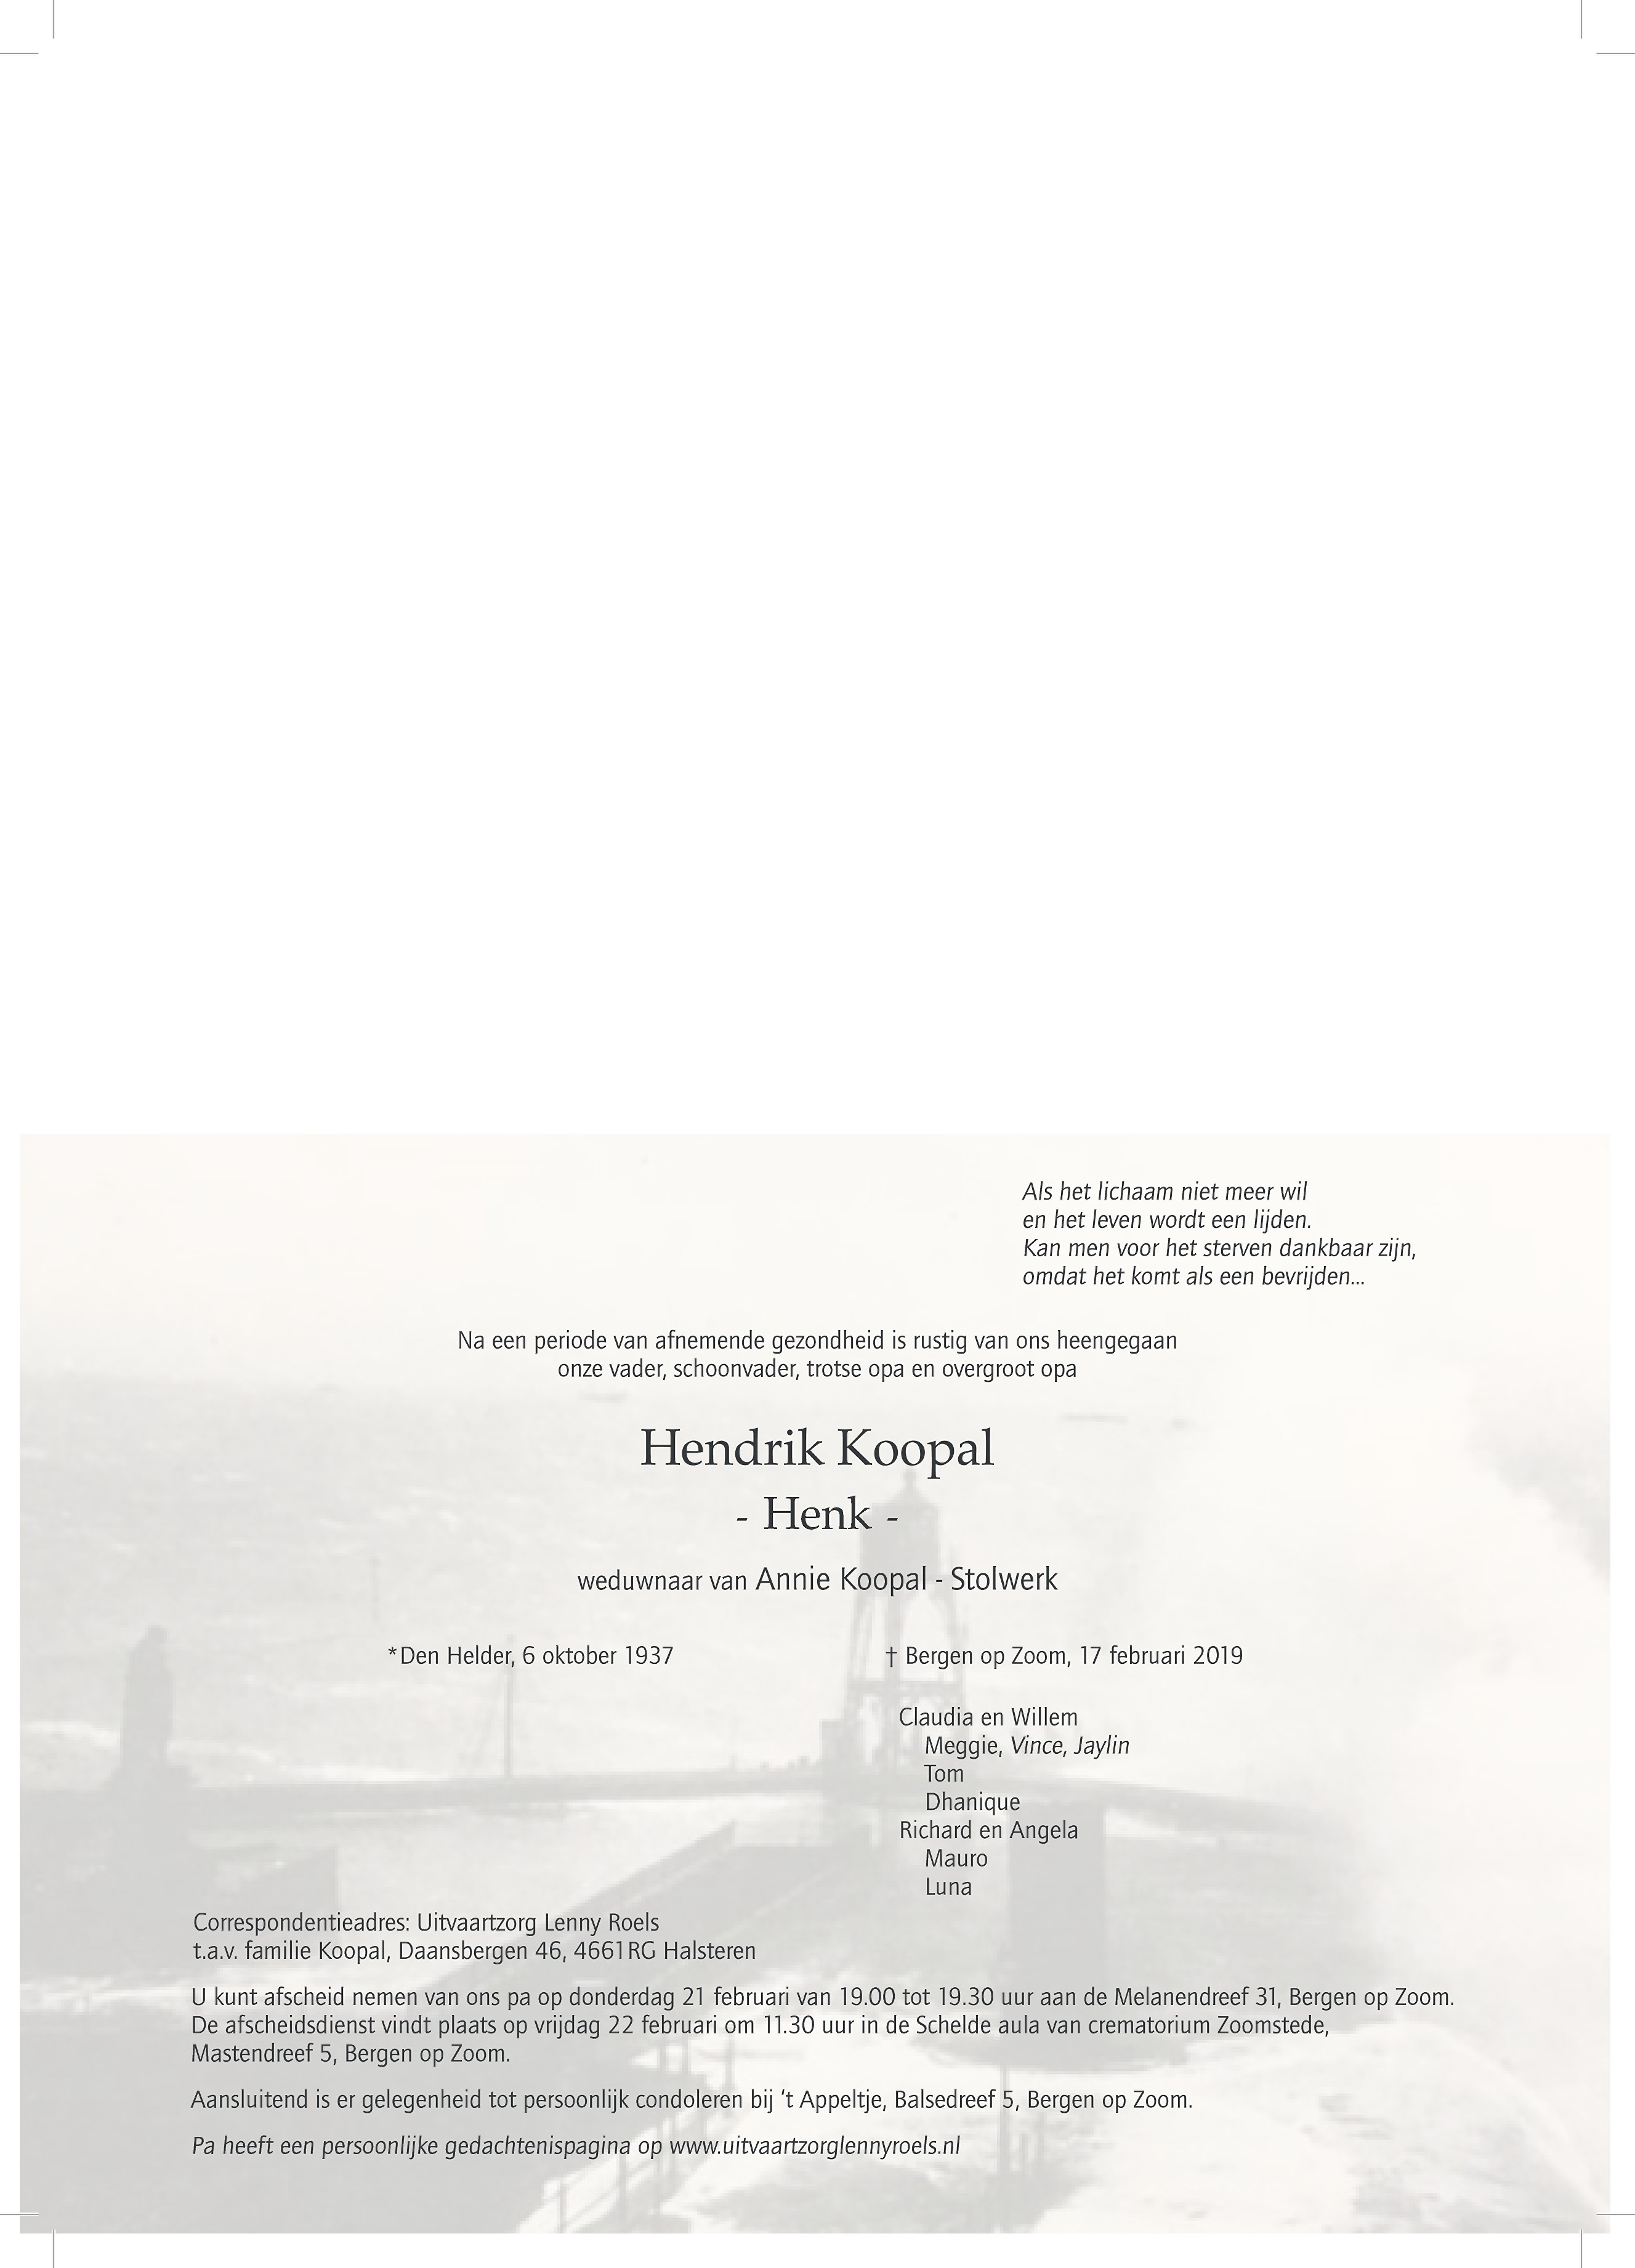 Hendrik Koopal Death notice